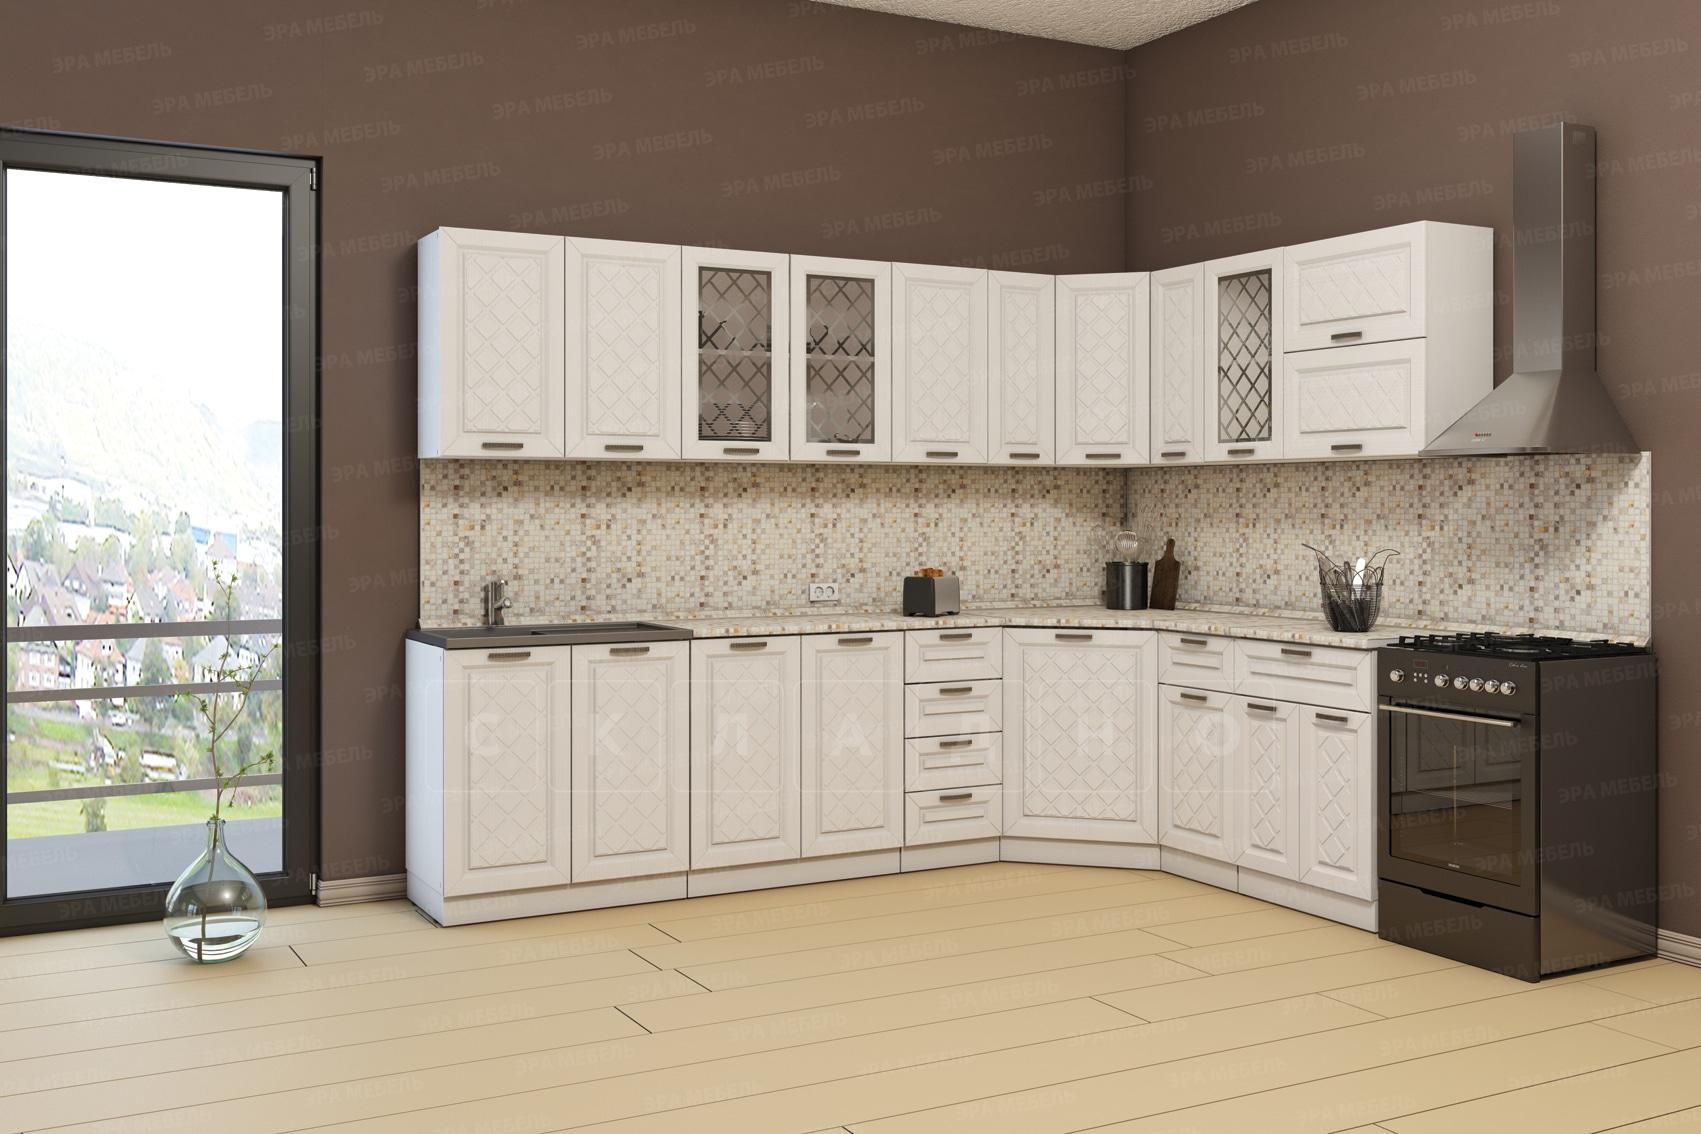 Кухня угловая Агава 1,85х2,85м фото 1 | интернет-магазин Складно